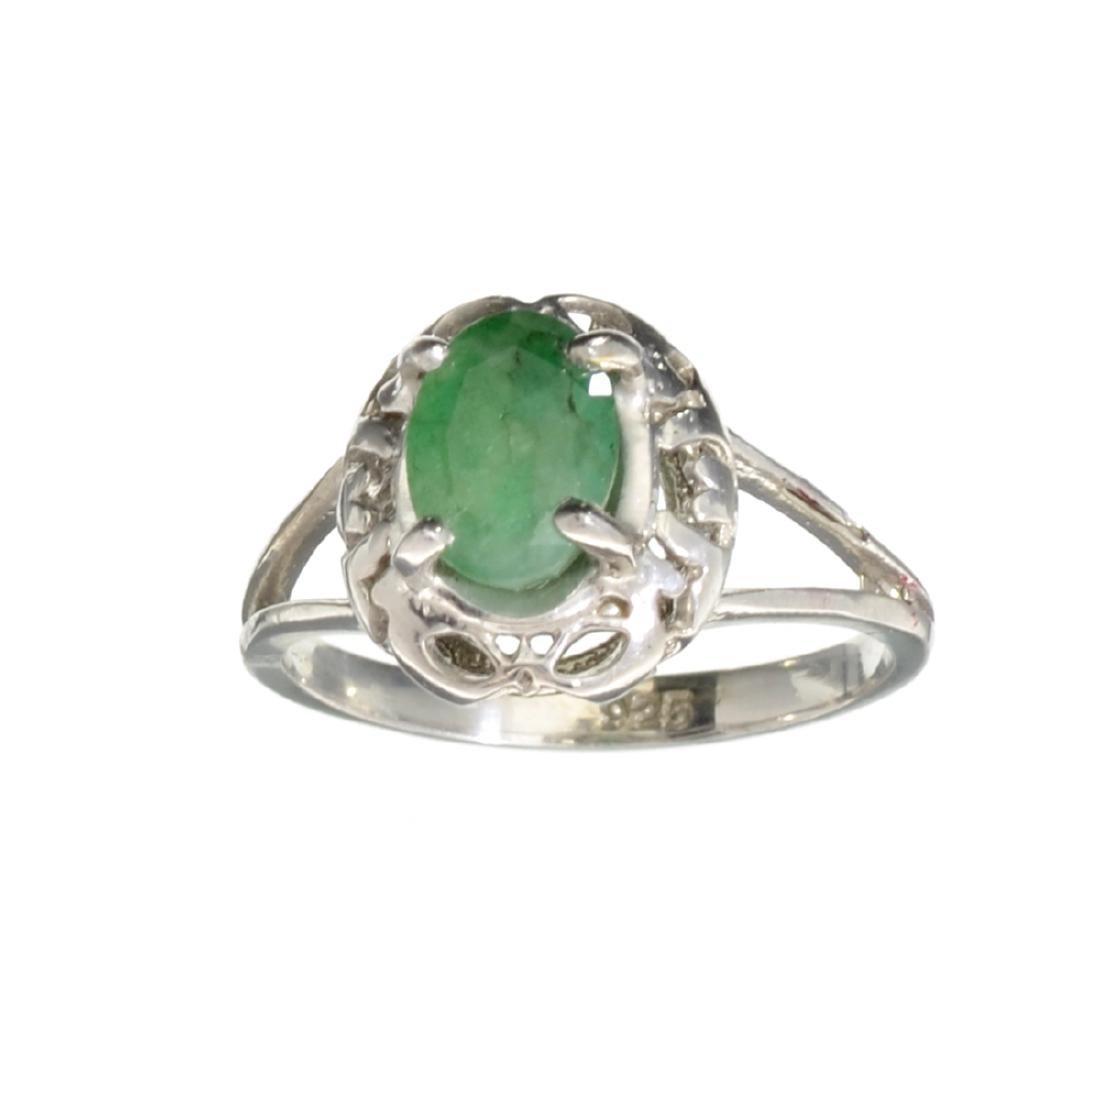 APP: 0.8k Fine Jewelry 0.96CT Oval Cut Green Emerald